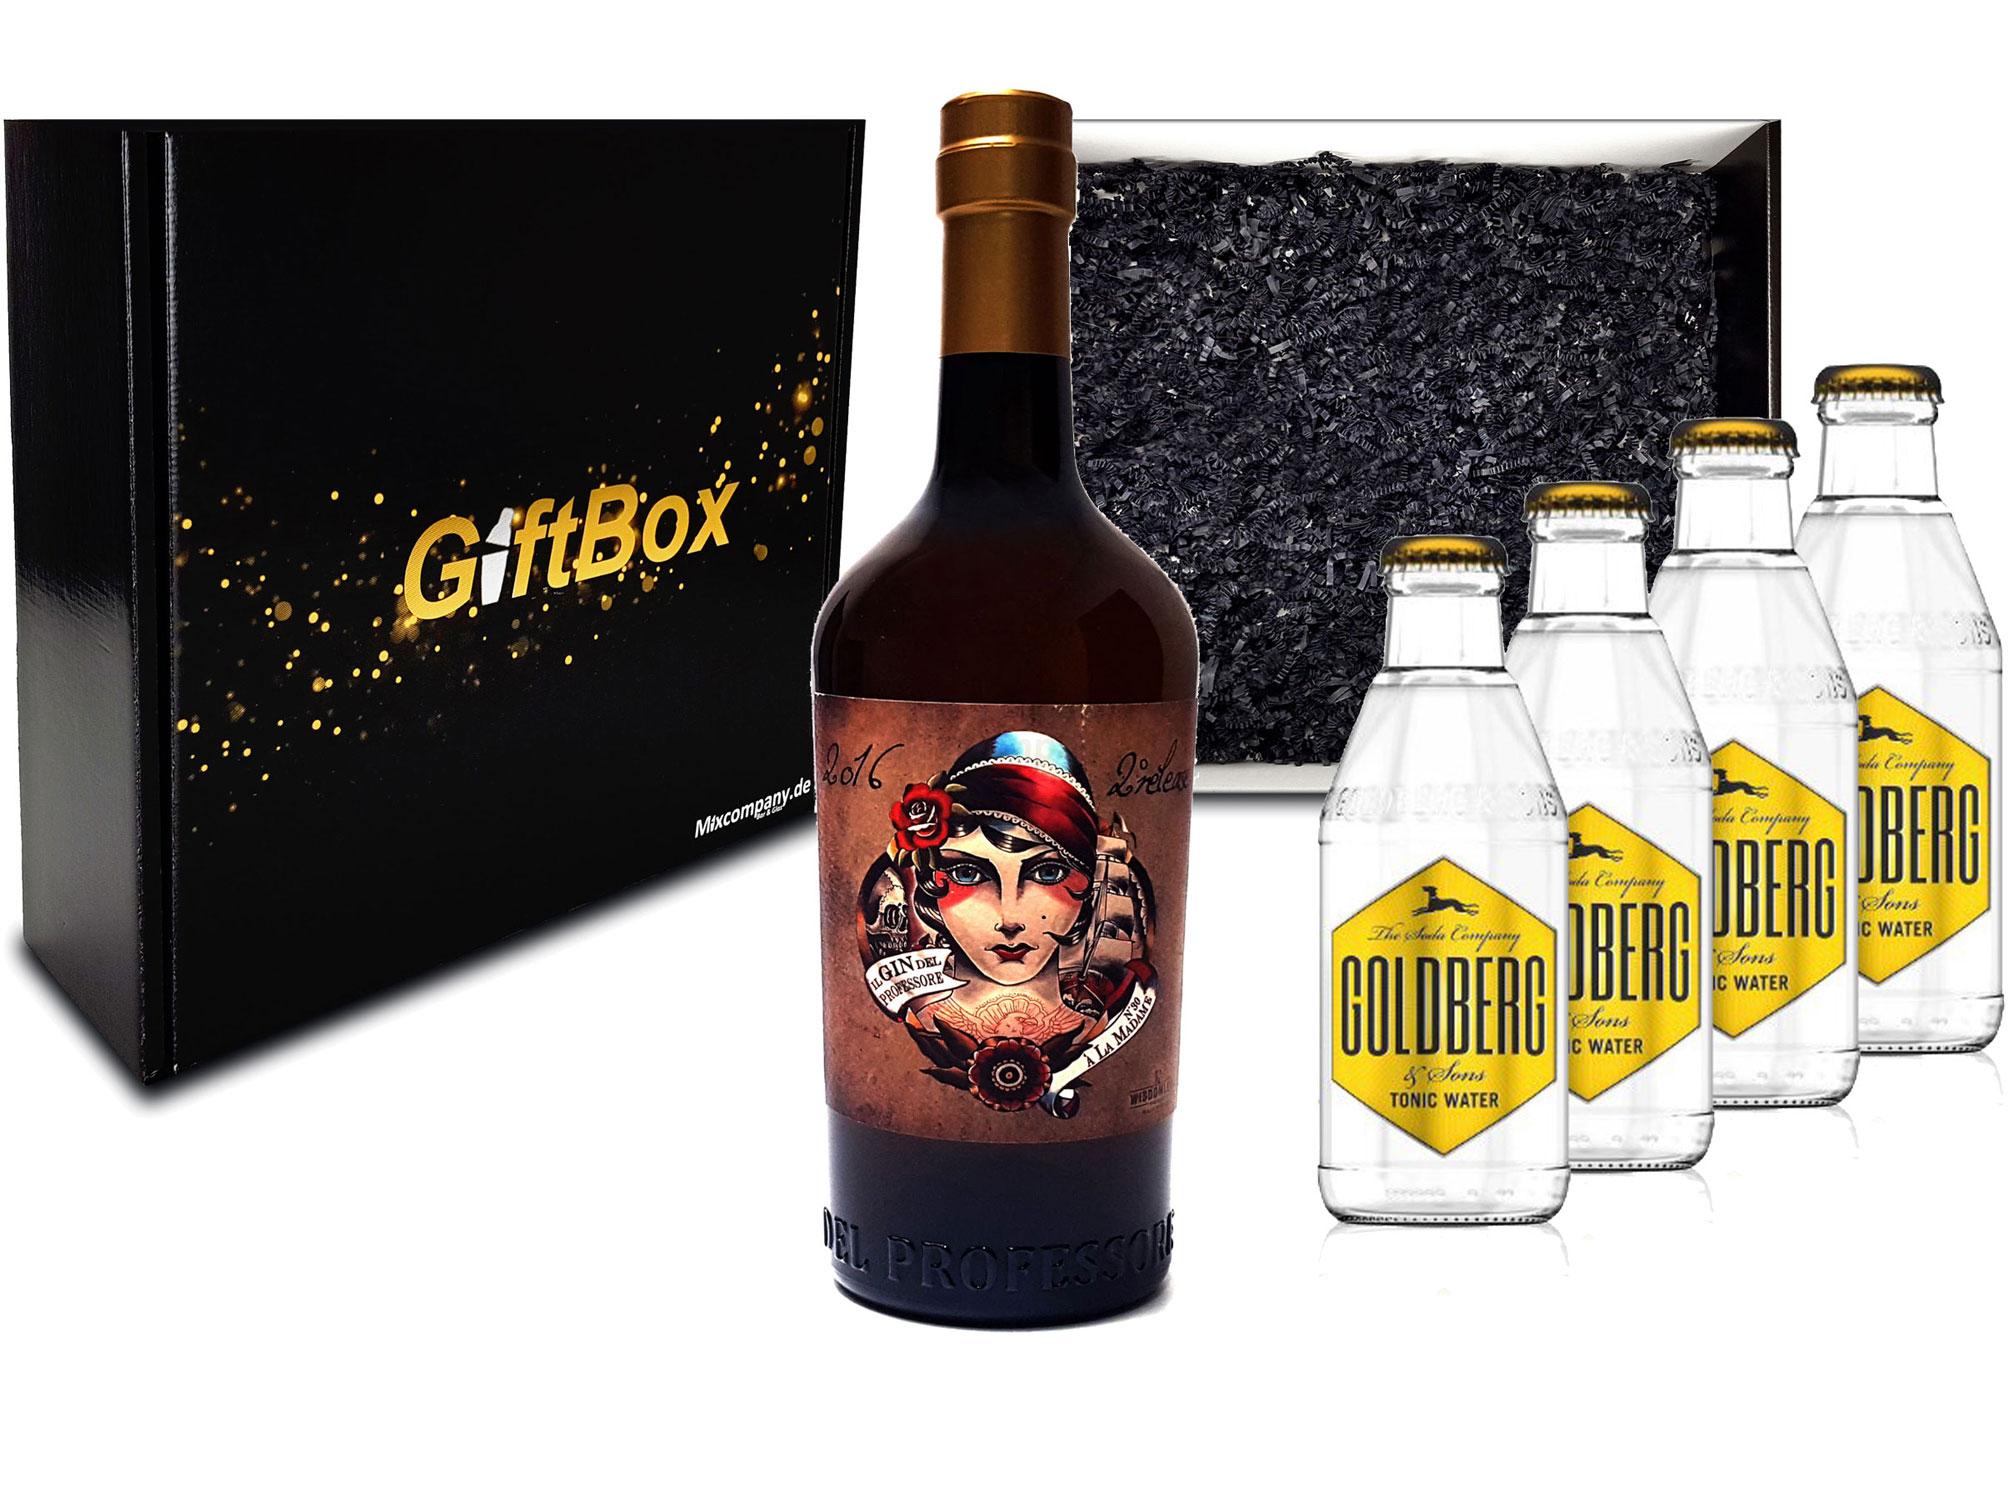 Gin Tonic Giftbox Geschenkset - Gin del Professore Madame 0,7l 700ml (42,9% Vol) + 4x Goldberg Tonic Water 200ml inkl. Pfand MEHRWEG - [Enthält Sulfite]